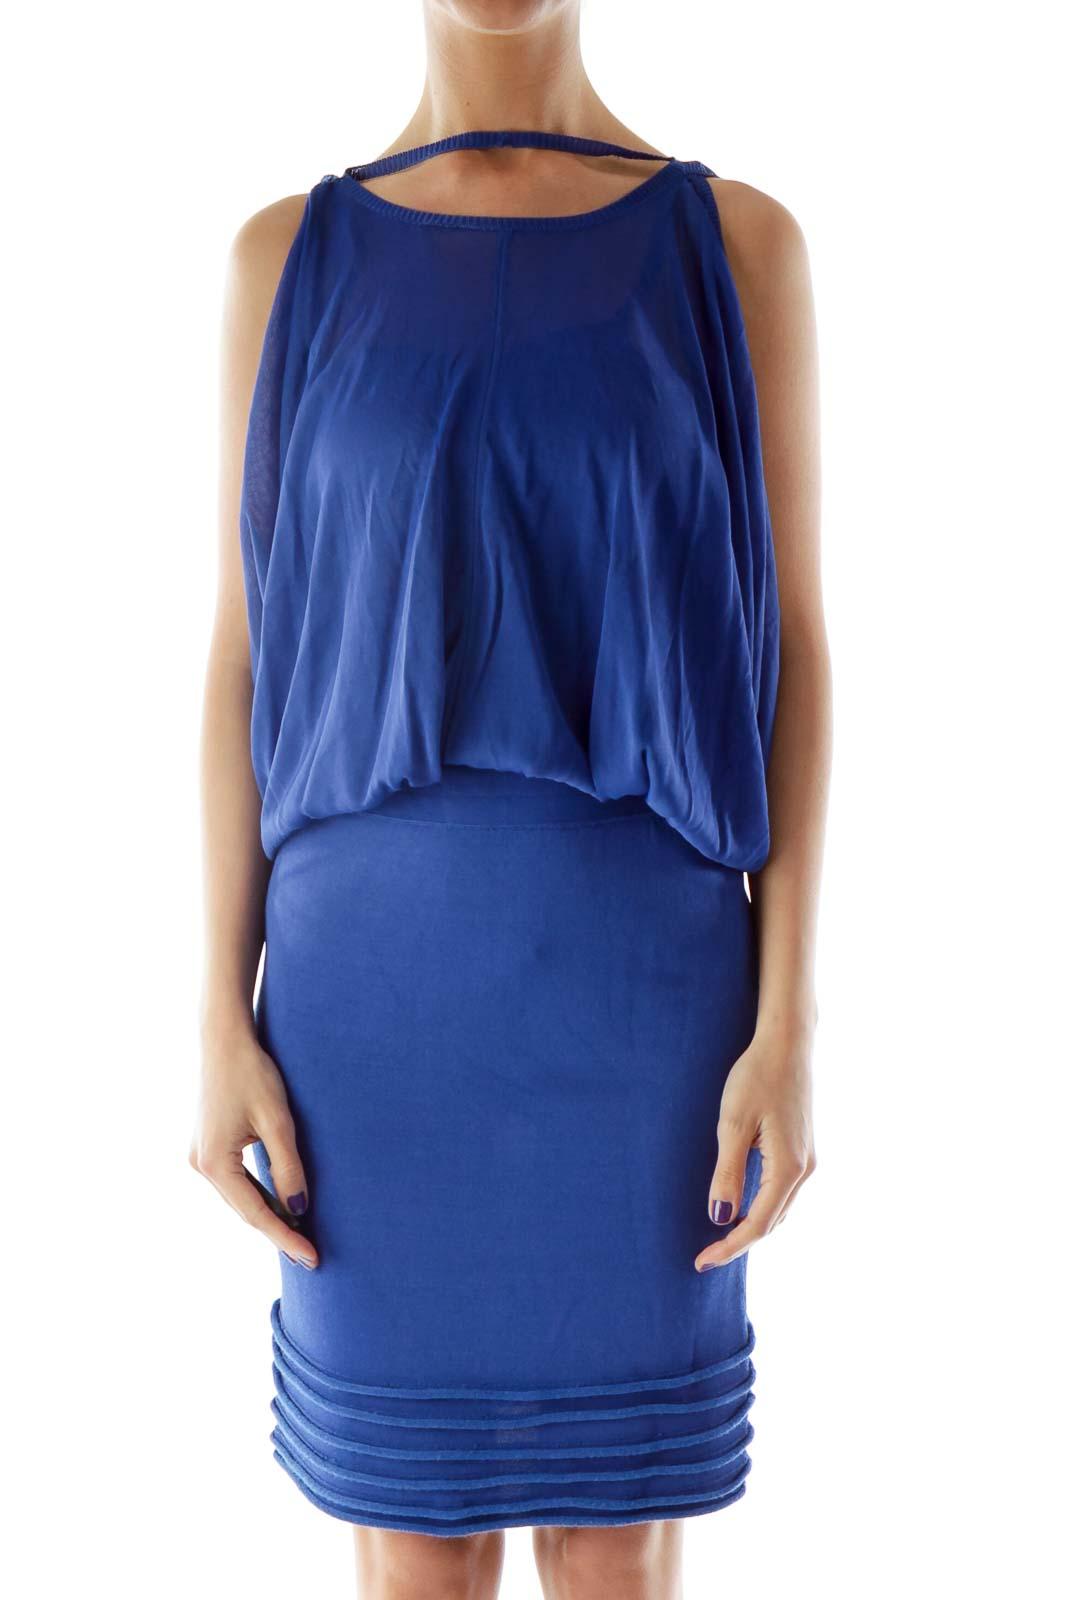 Blue Sheer Dress Front